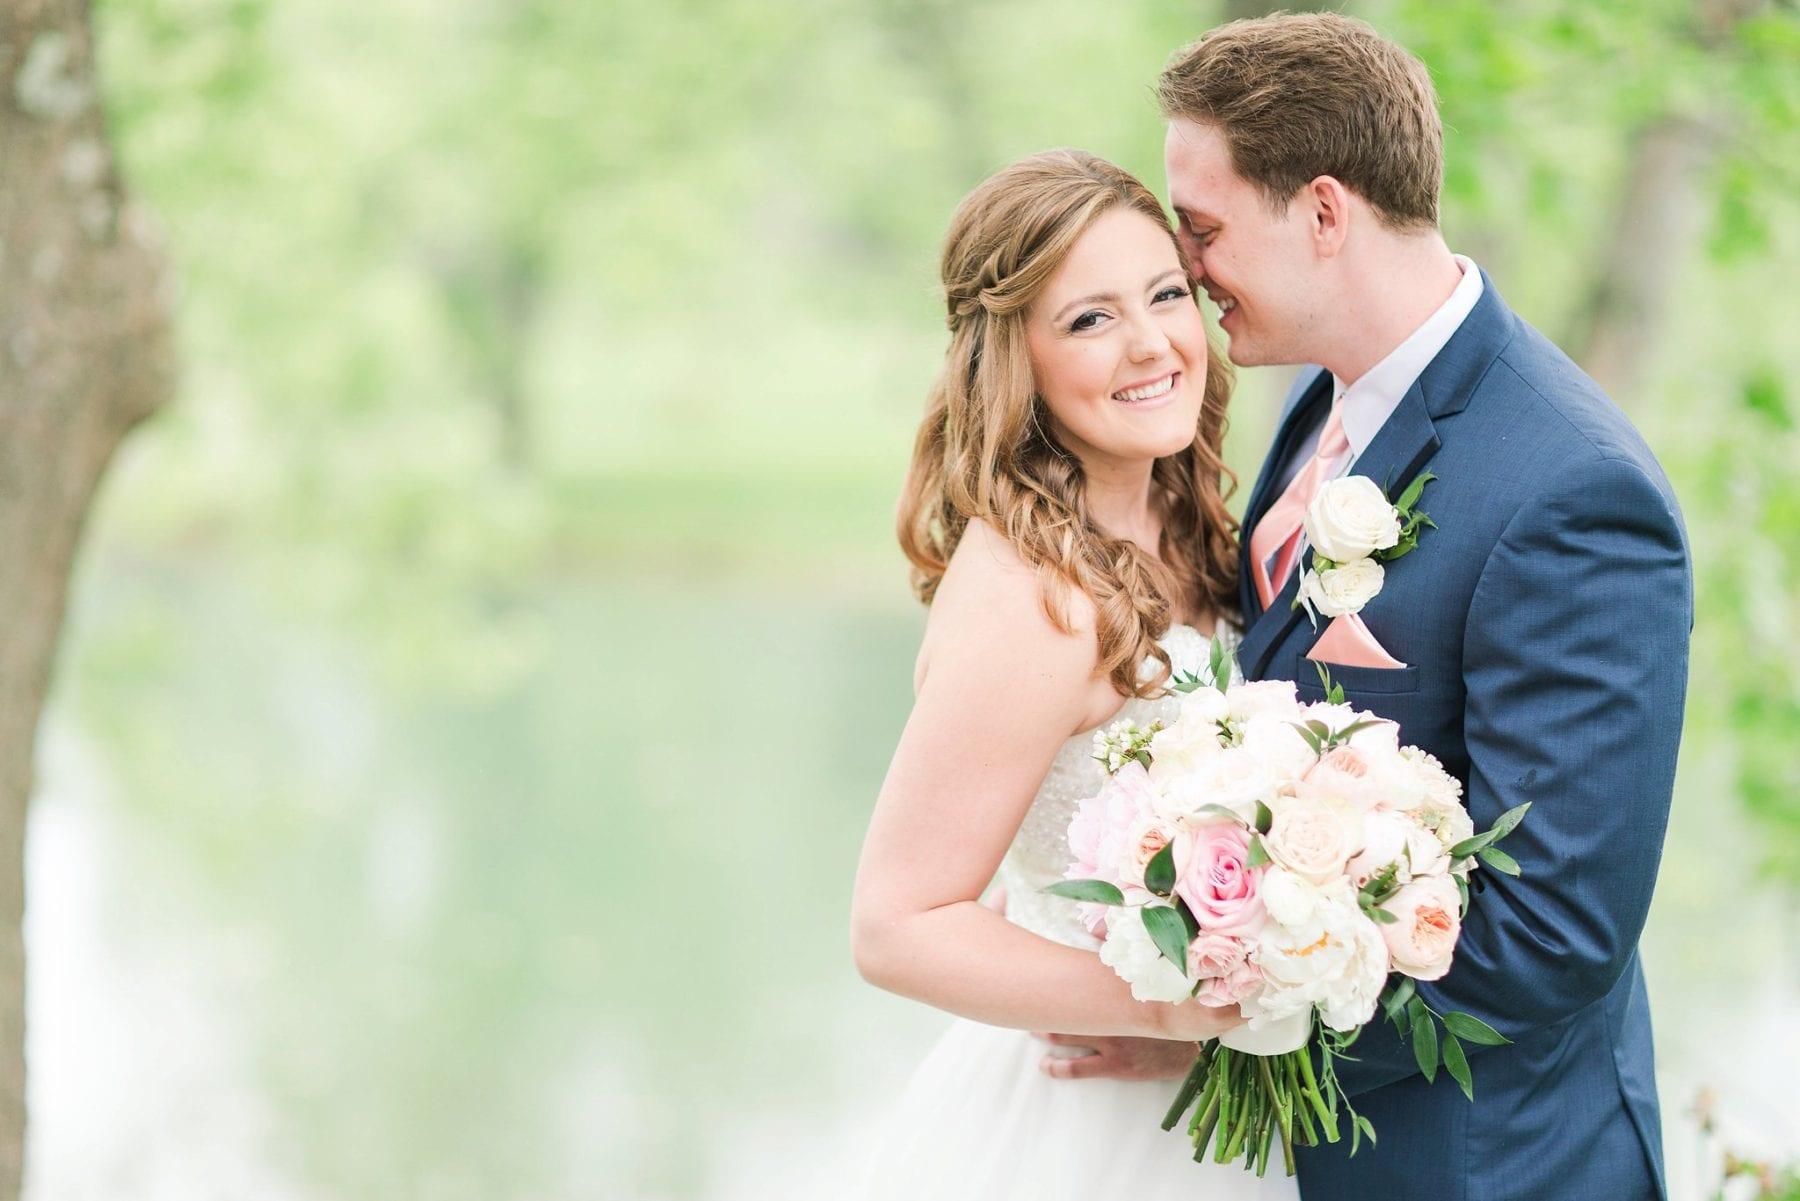 Justin & Megan Big Spring Farm Wedding Photos-106.jpg